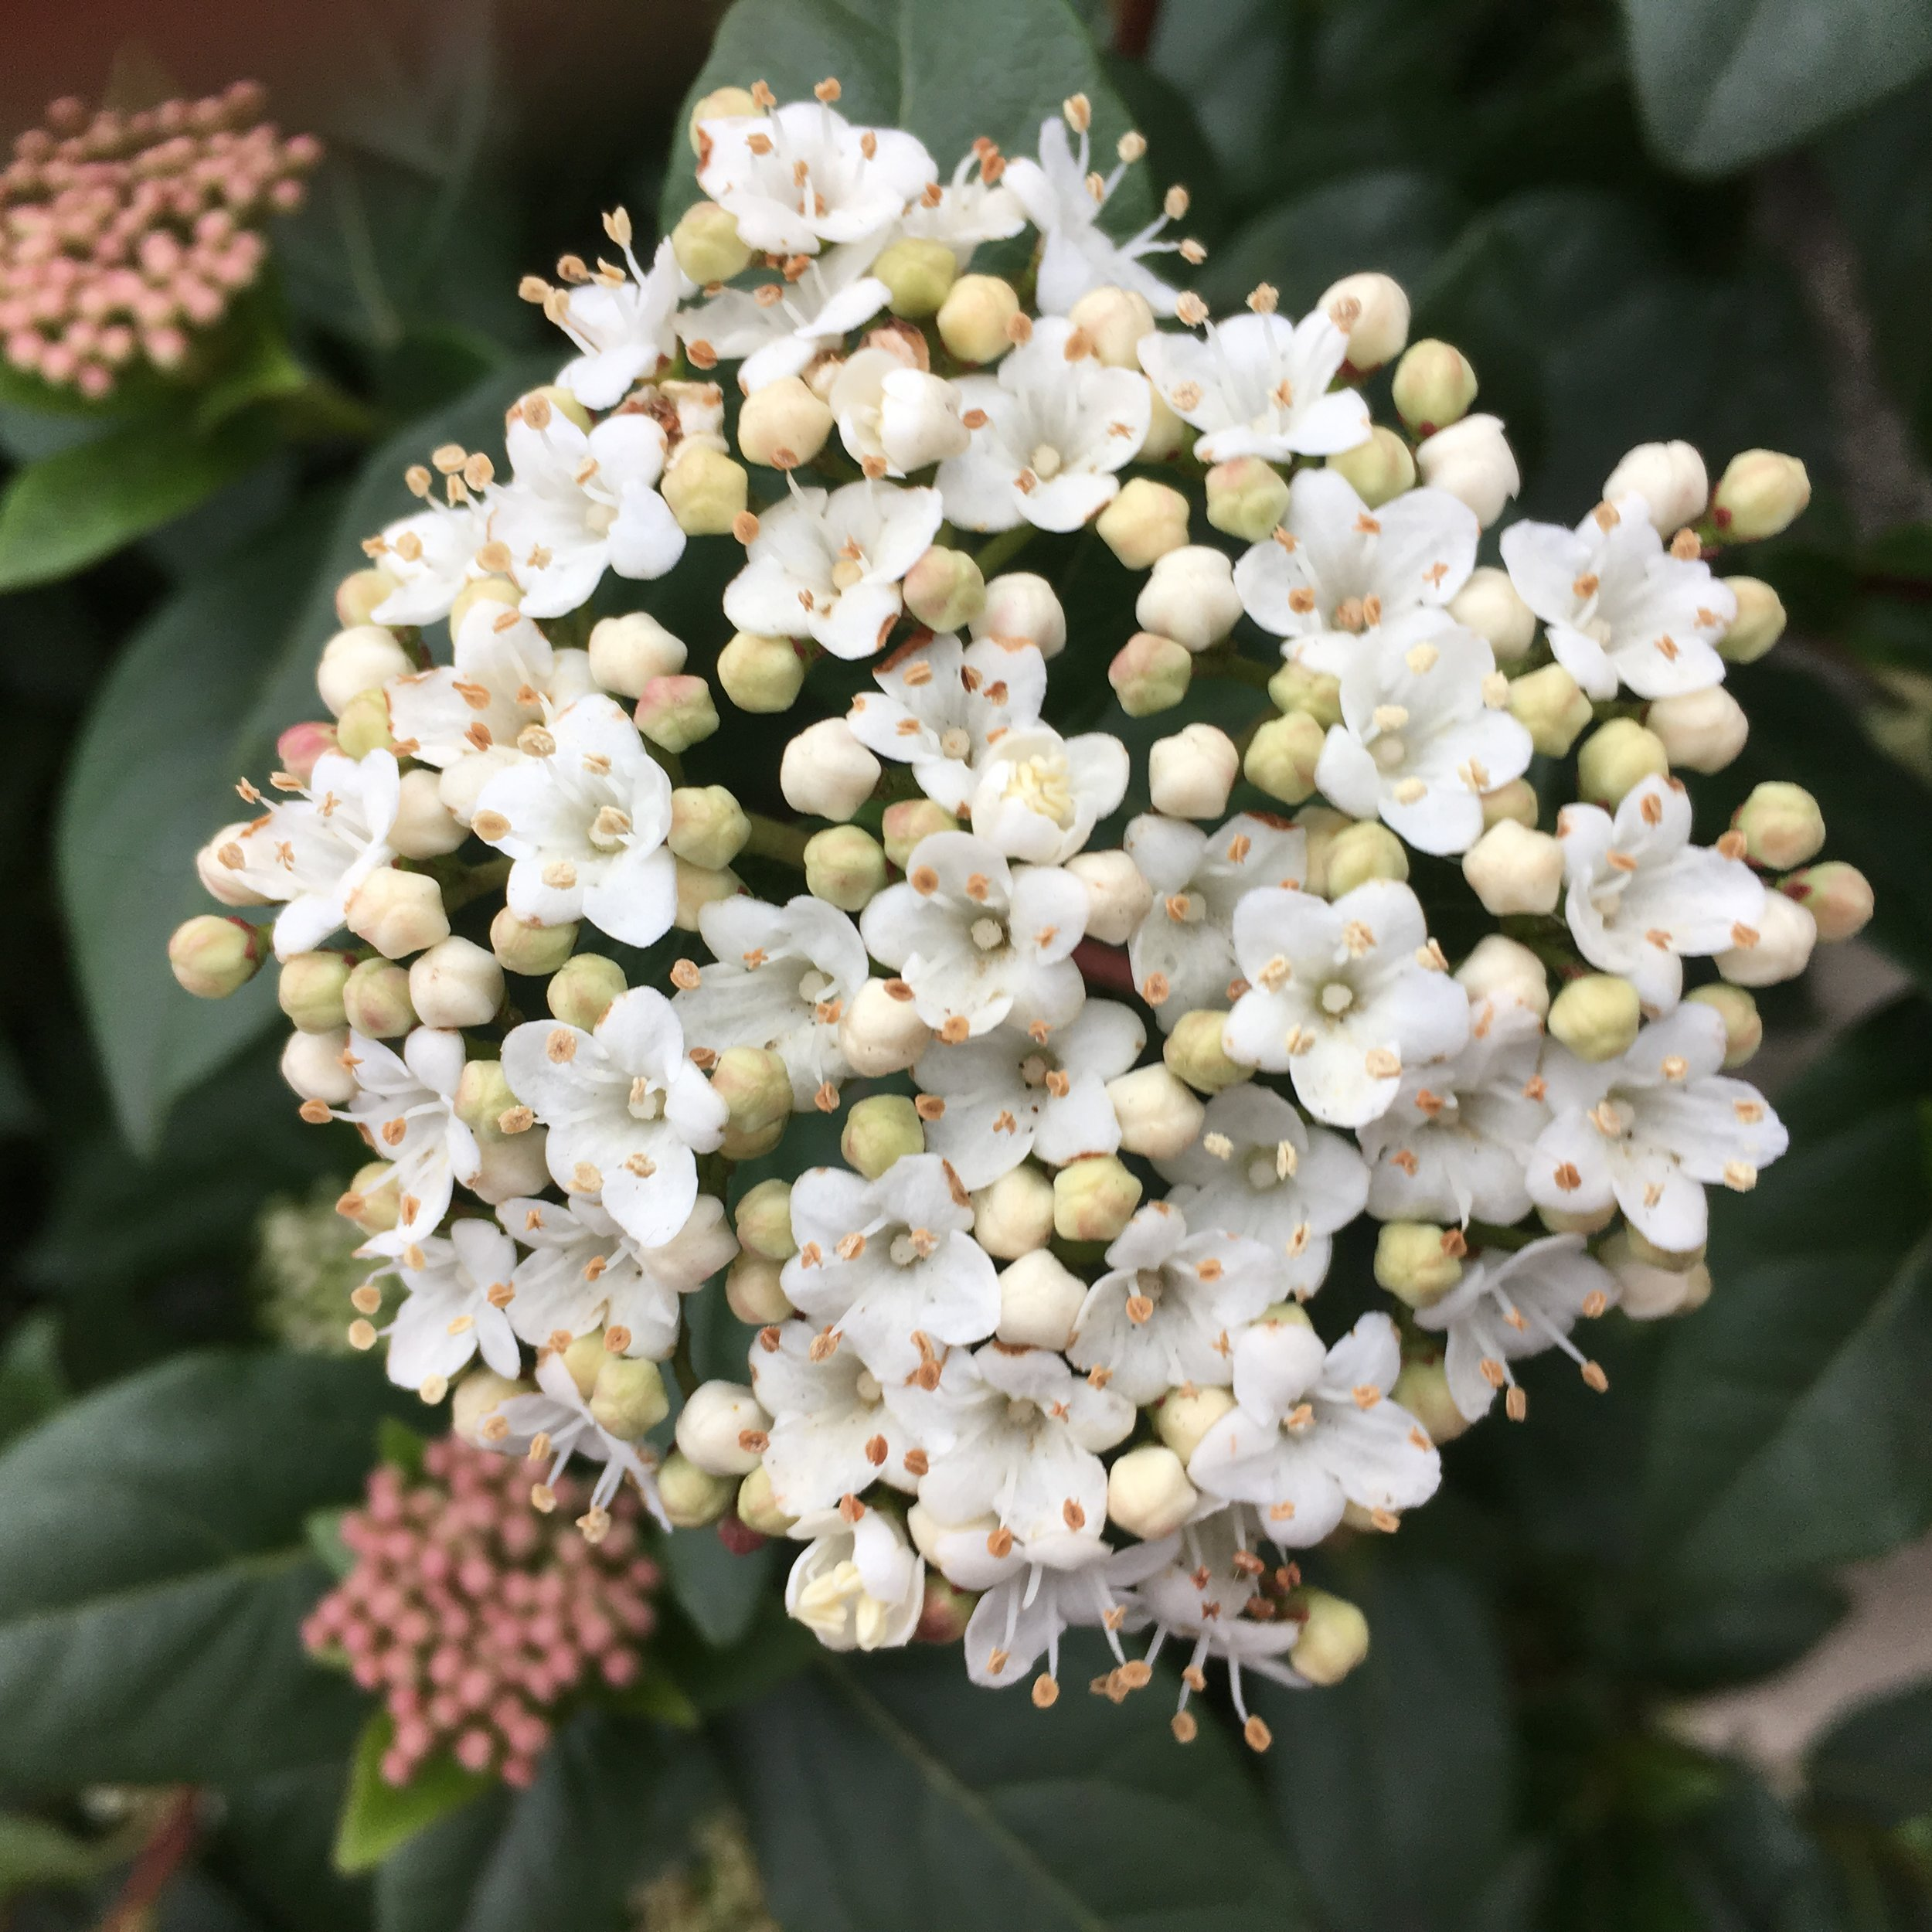 This Viburnum shrub has beautiful posy like clusters. Delicate and romantic.